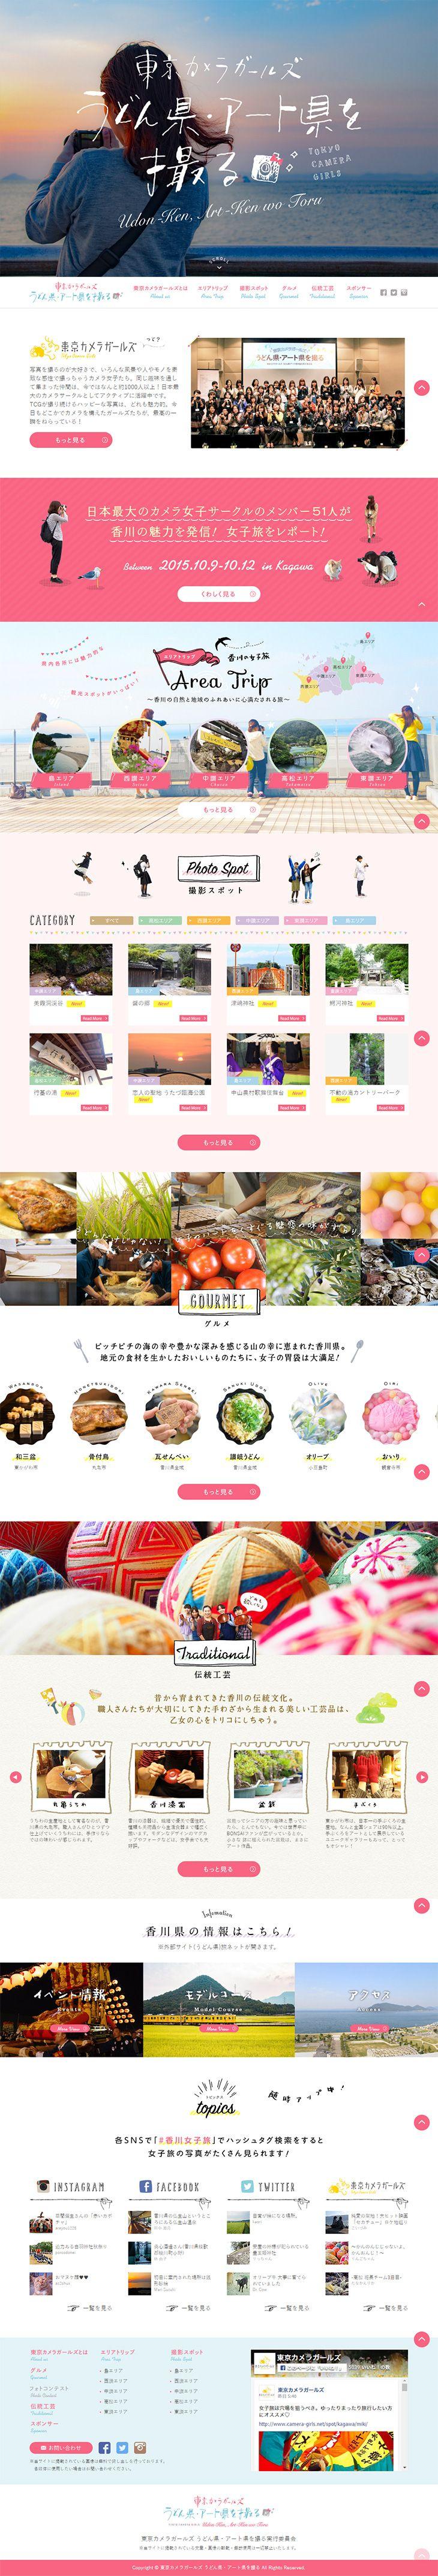 screencapture-www-tcg-kagawa-com-1459326525095.jpg (730×4297)